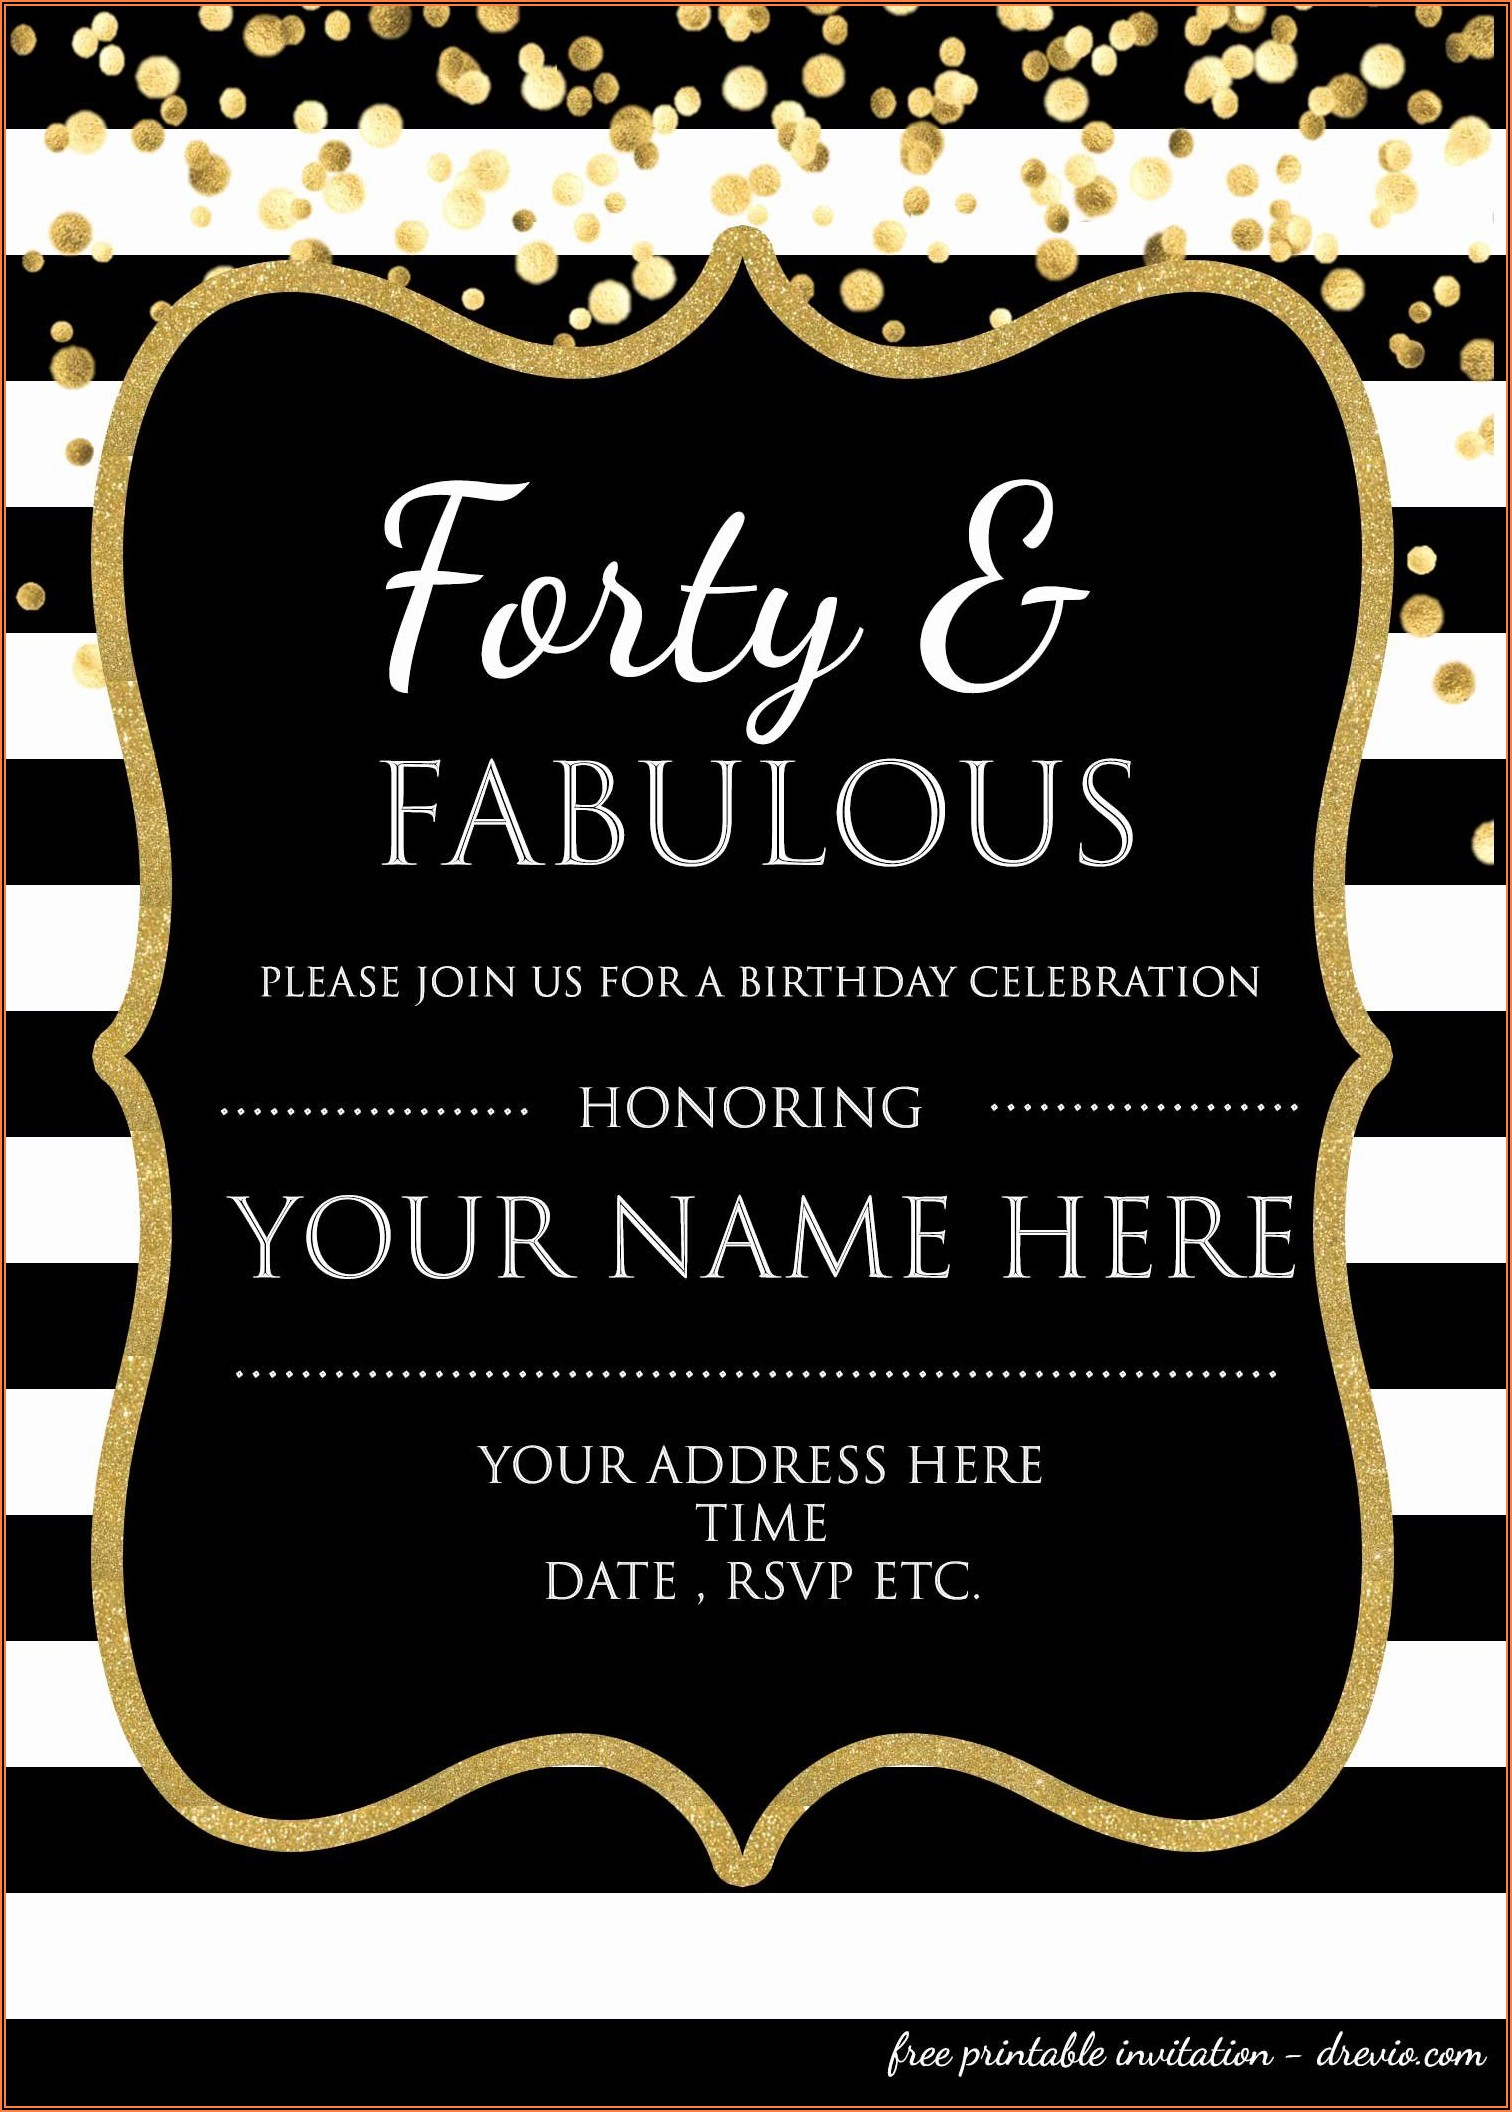 Free Editable Birthday Invitations Templates